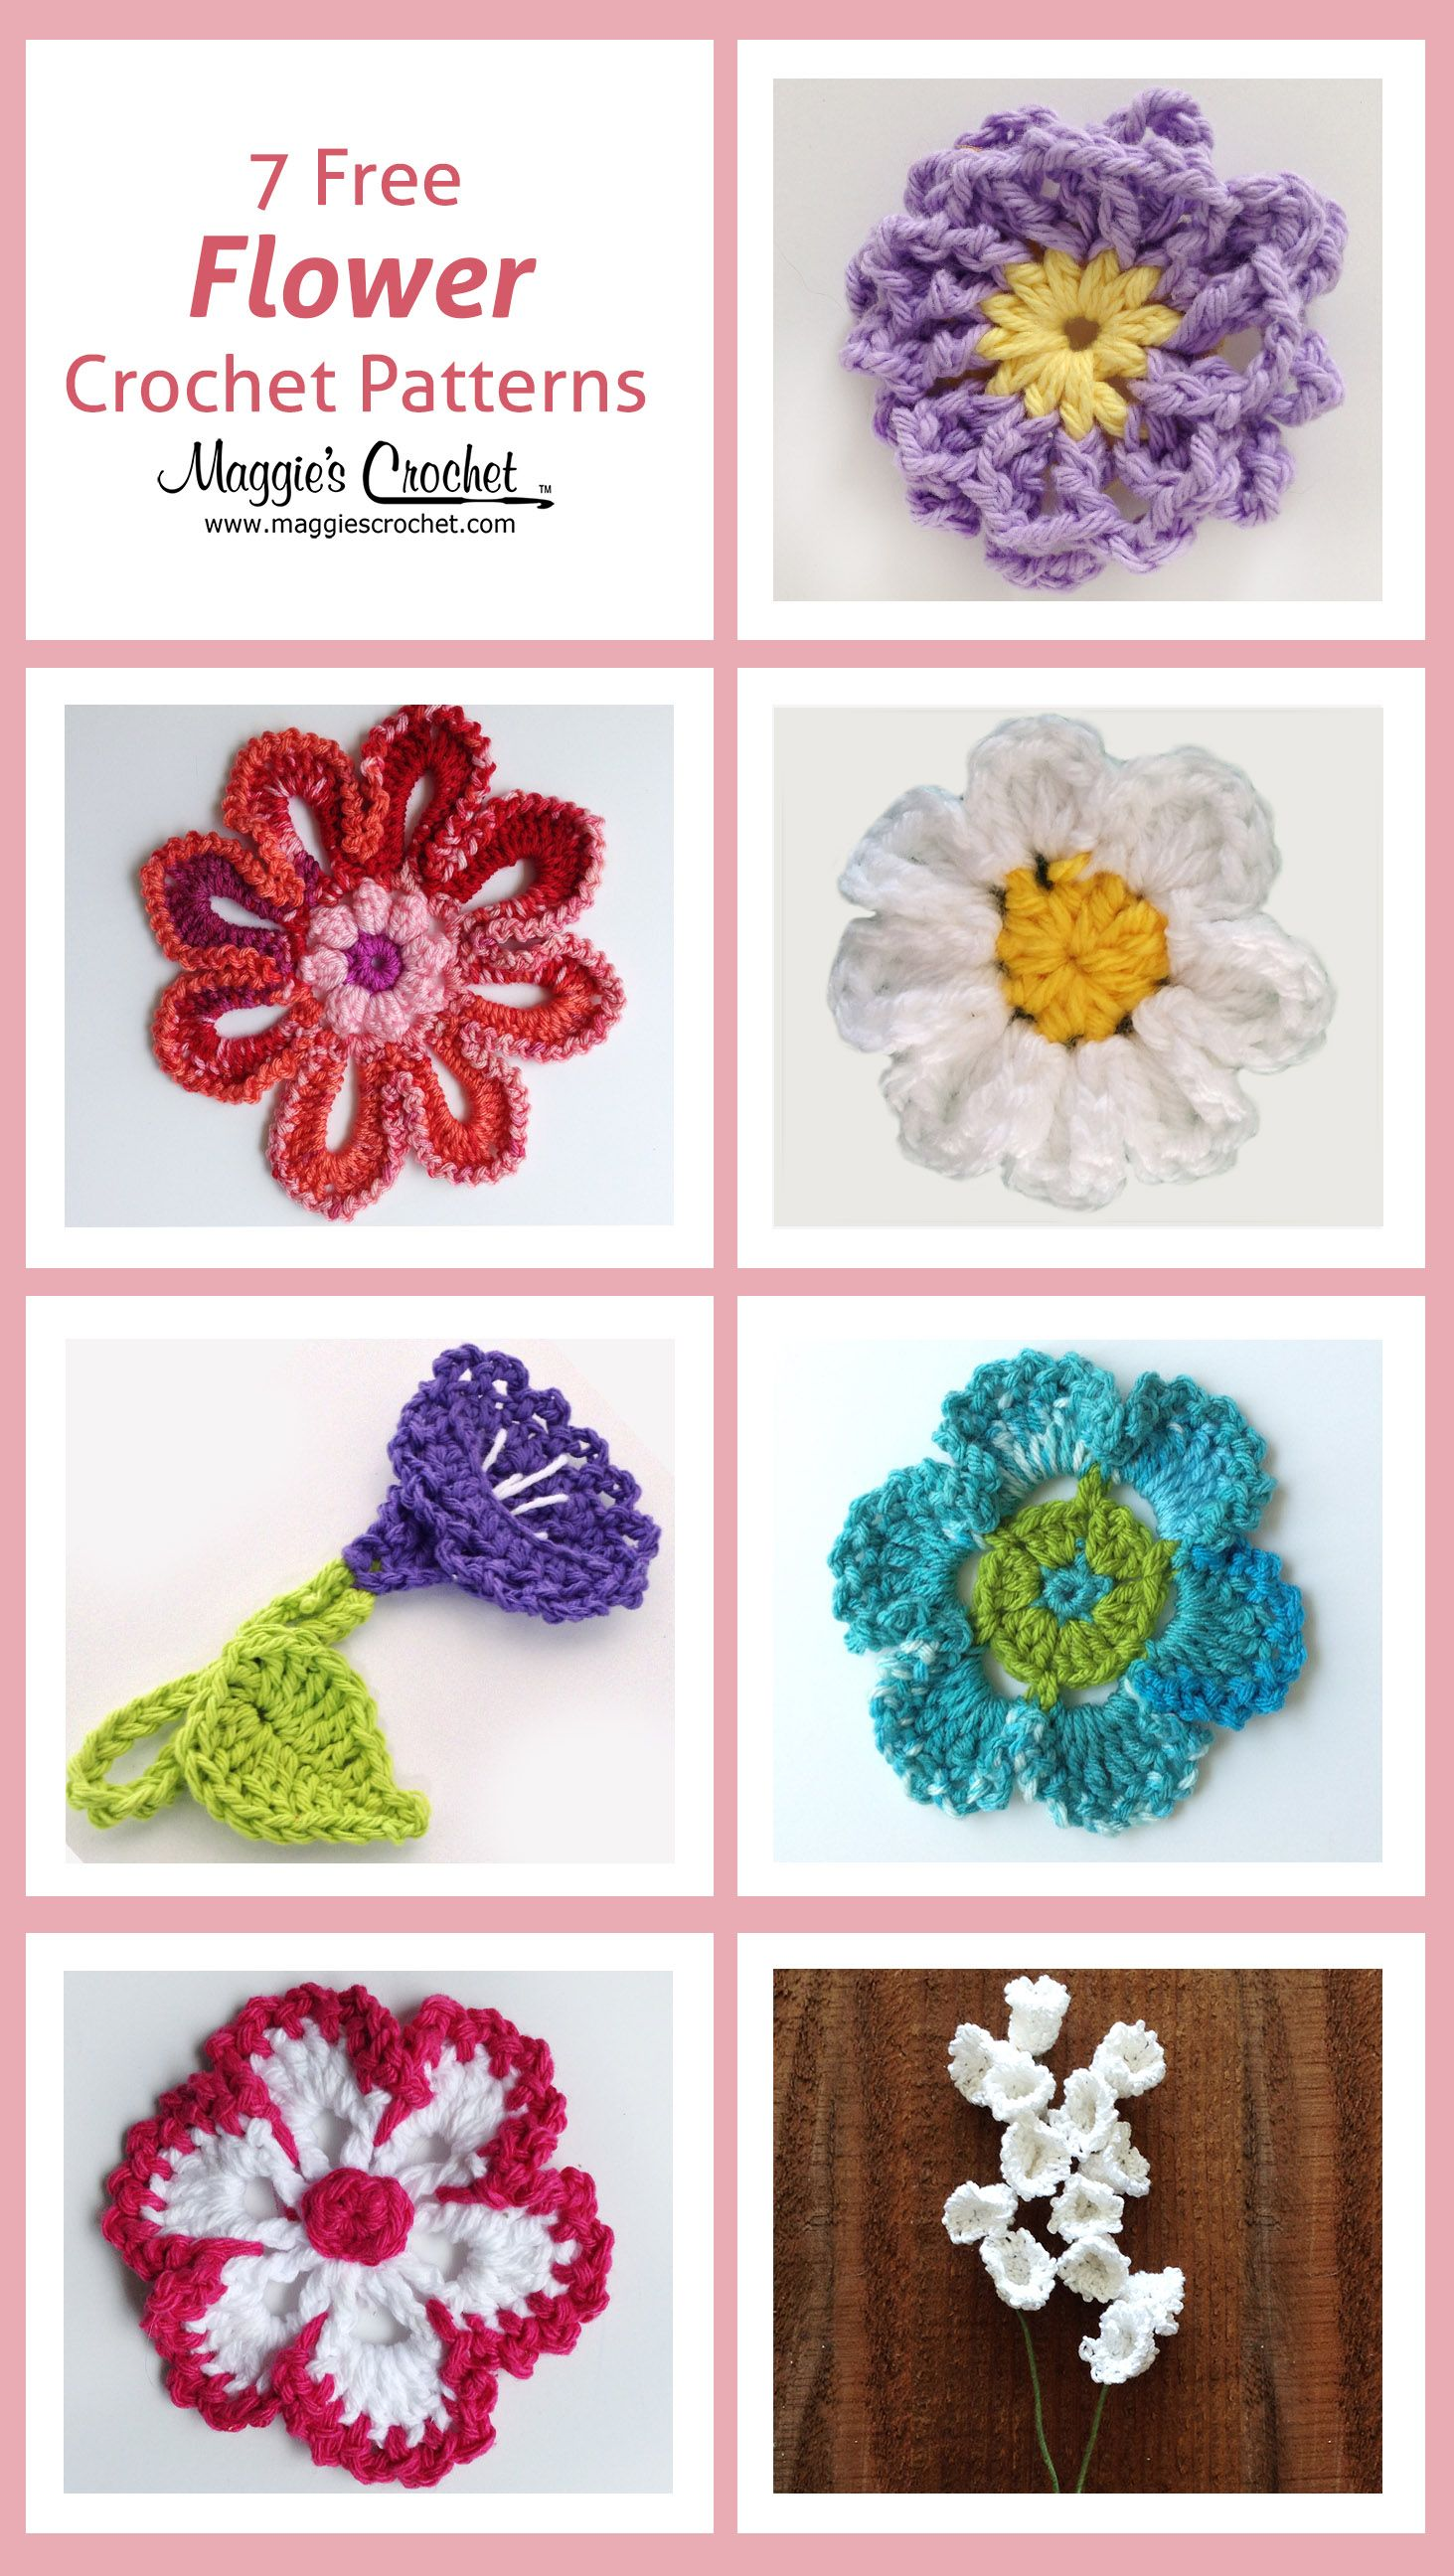 7 Free Flower Crochet Patterns from Maggie\'s Crochet | brincos ...